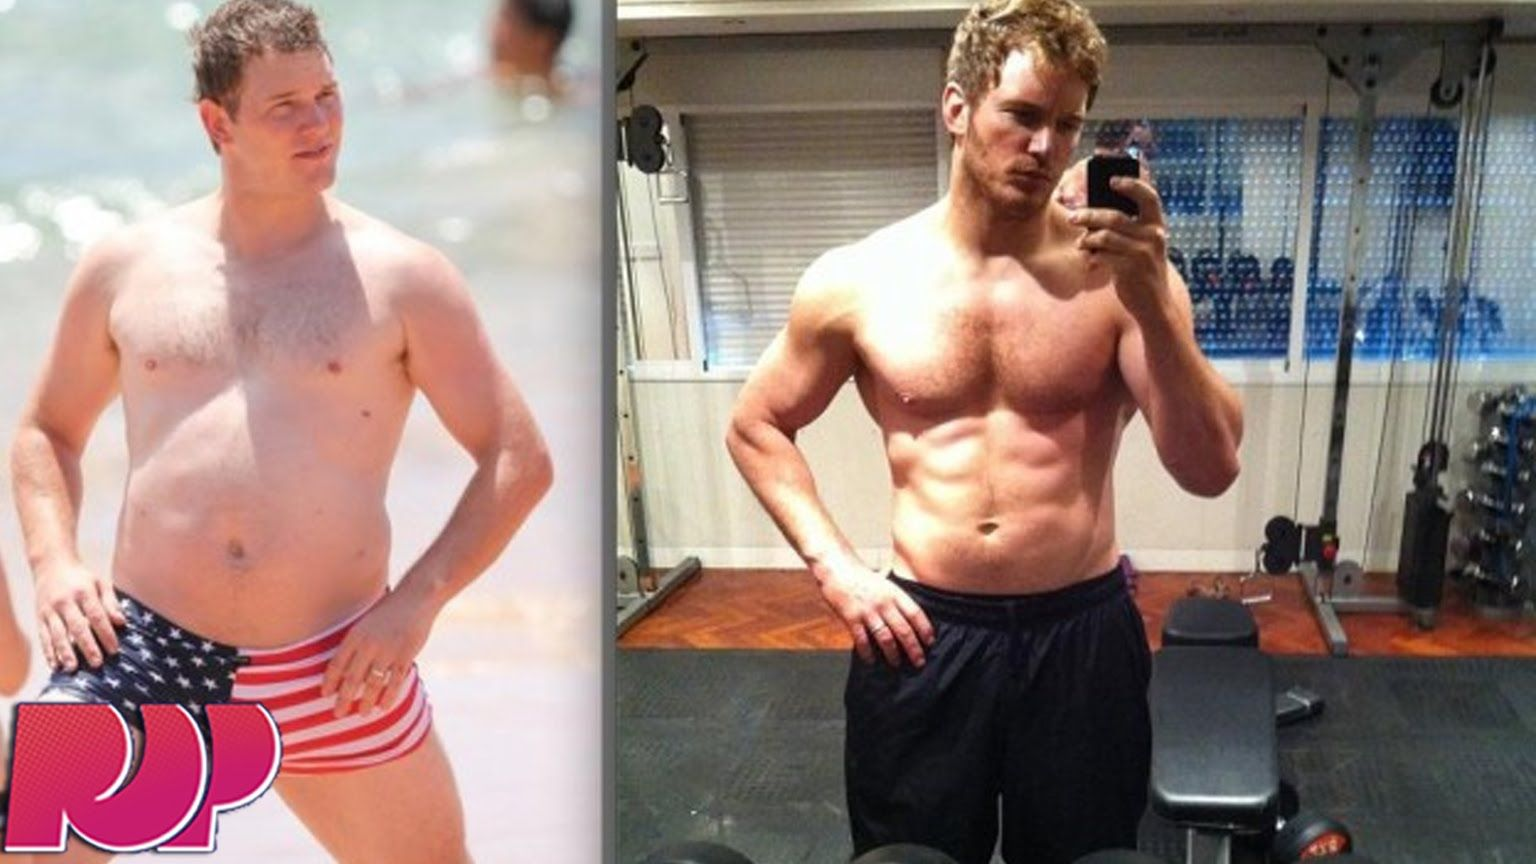 The chris pratt body transformation how to become an action hero the chris pratt body transformation how to become an action hero altavistaventures Gallery